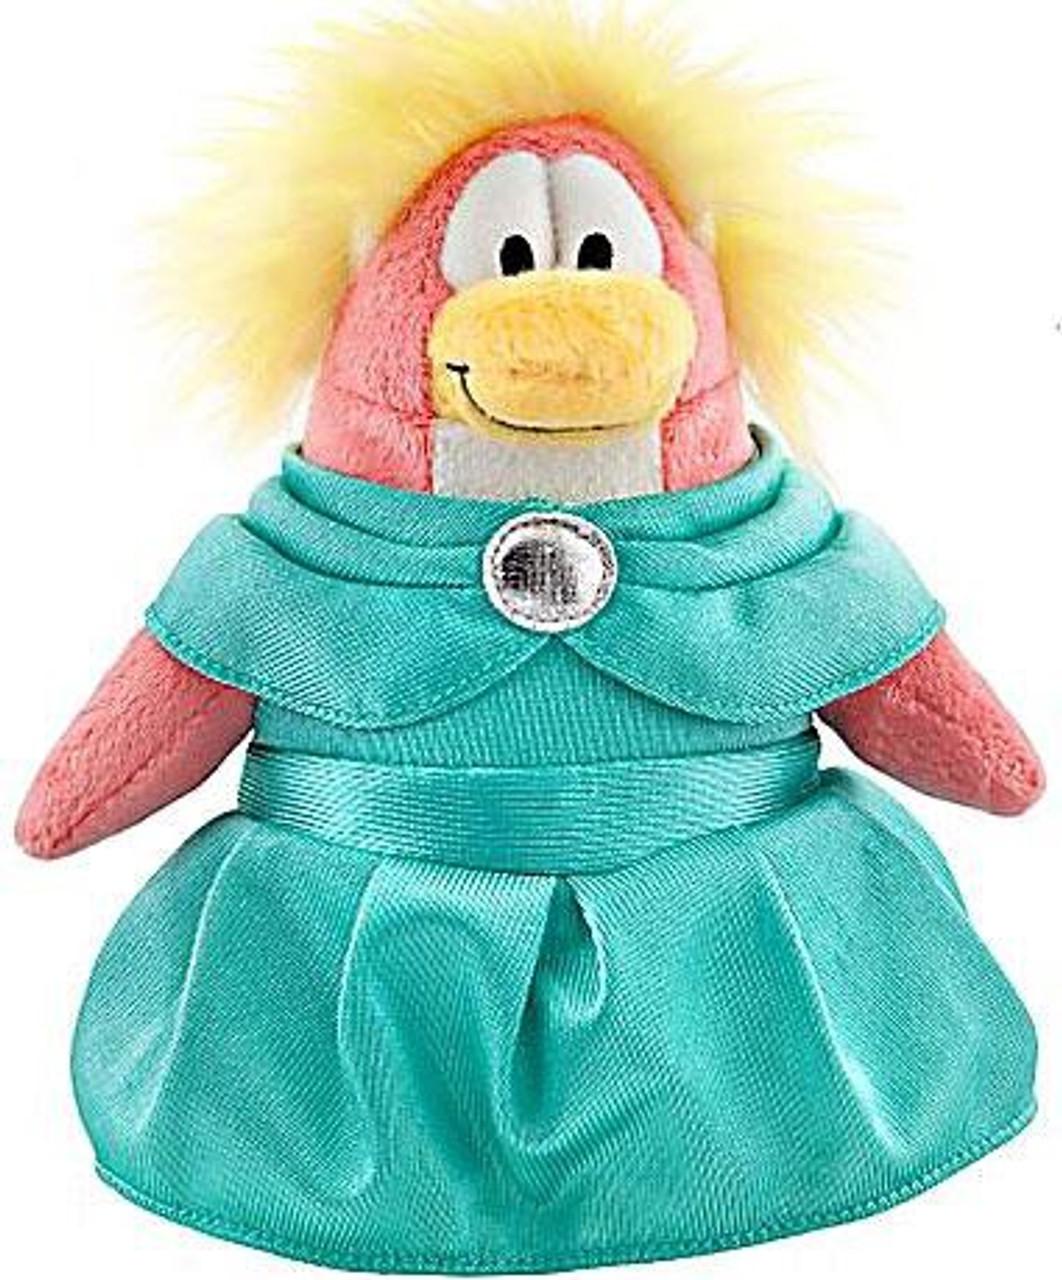 Club Penguin Series 8 Prom Girl 6.5-Inch Plush Figure